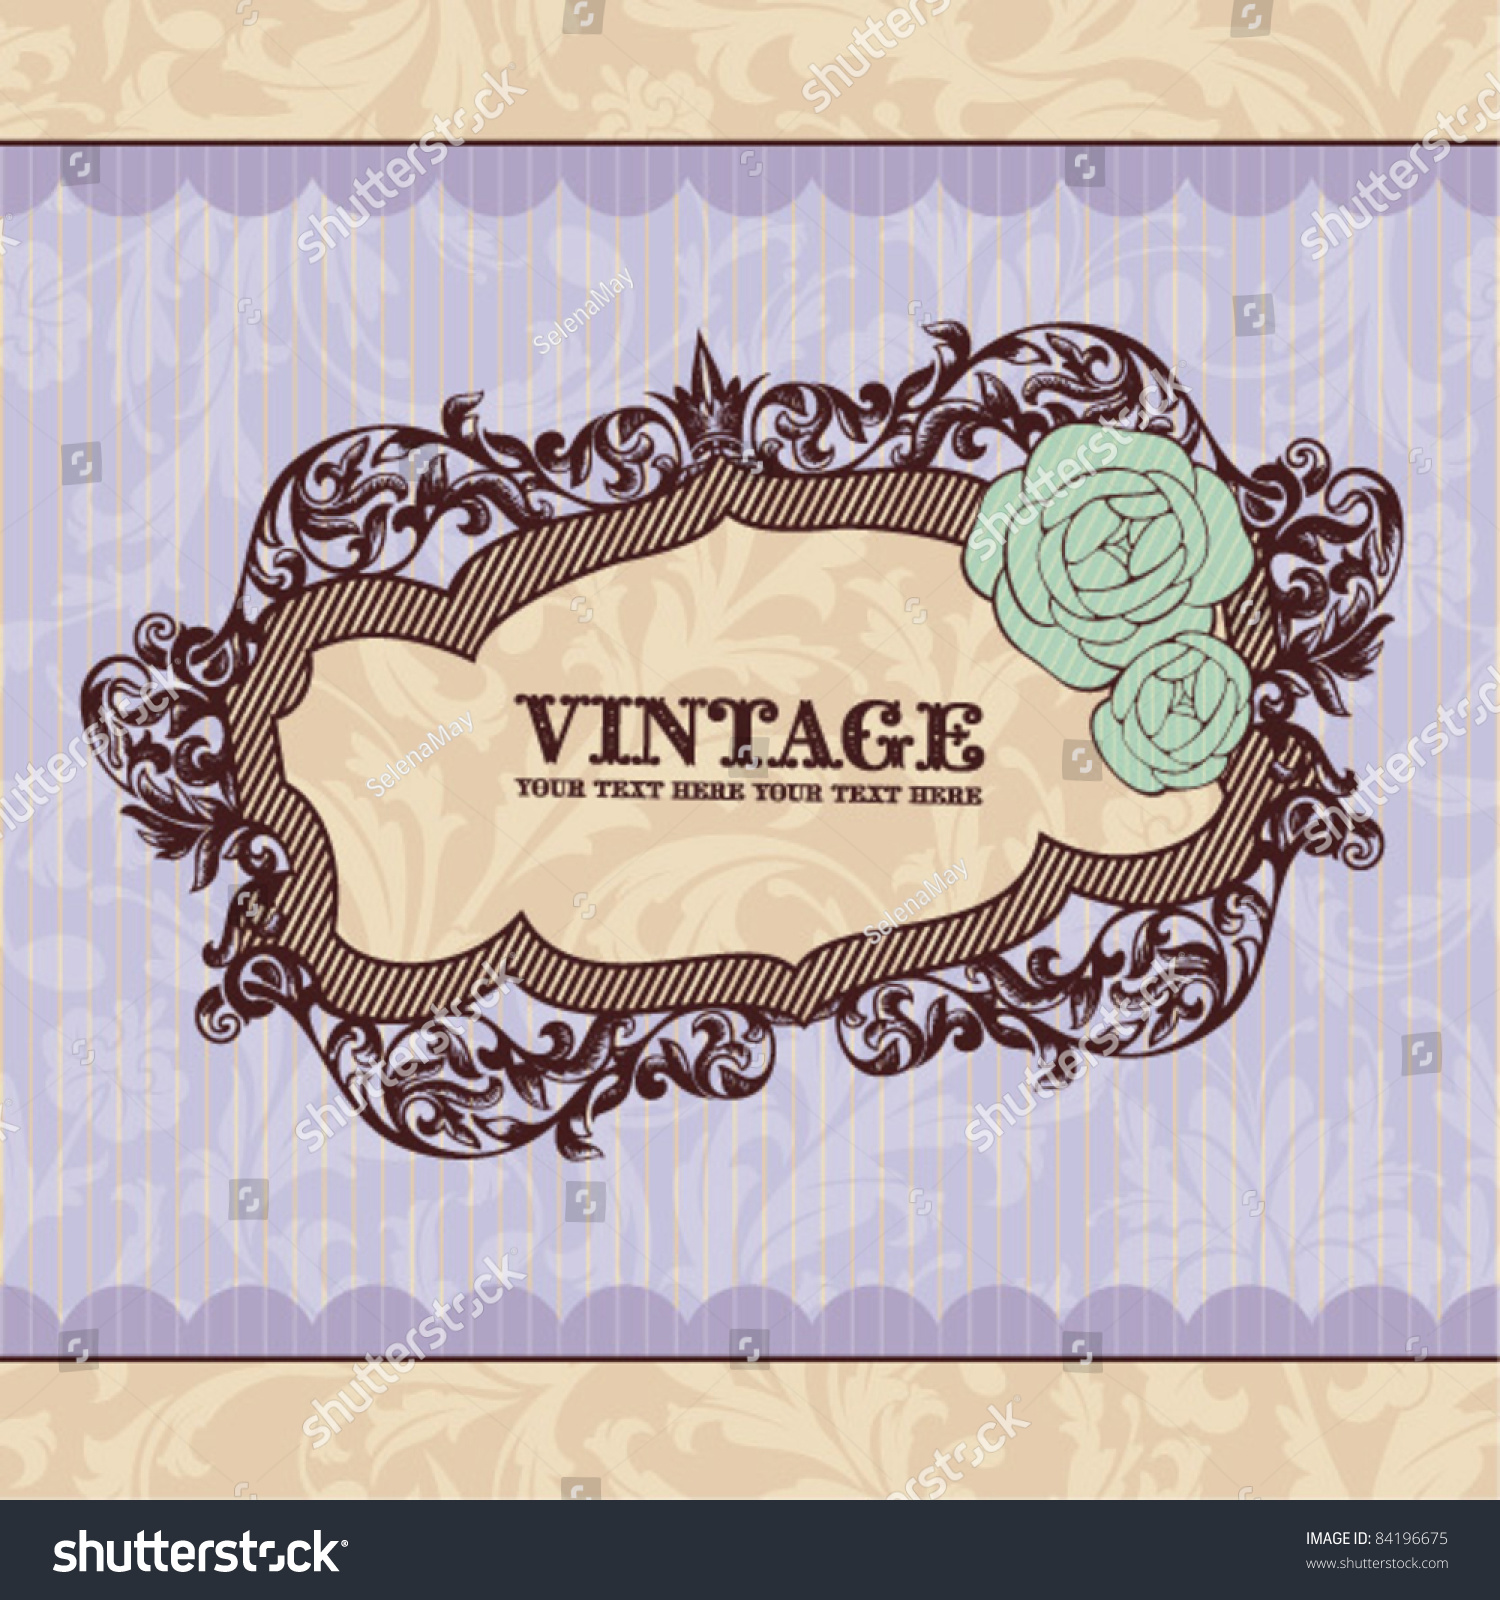 Royal Vintage Frame Great For Greeting Cards And Invitations – Greeting Cards and Invitations